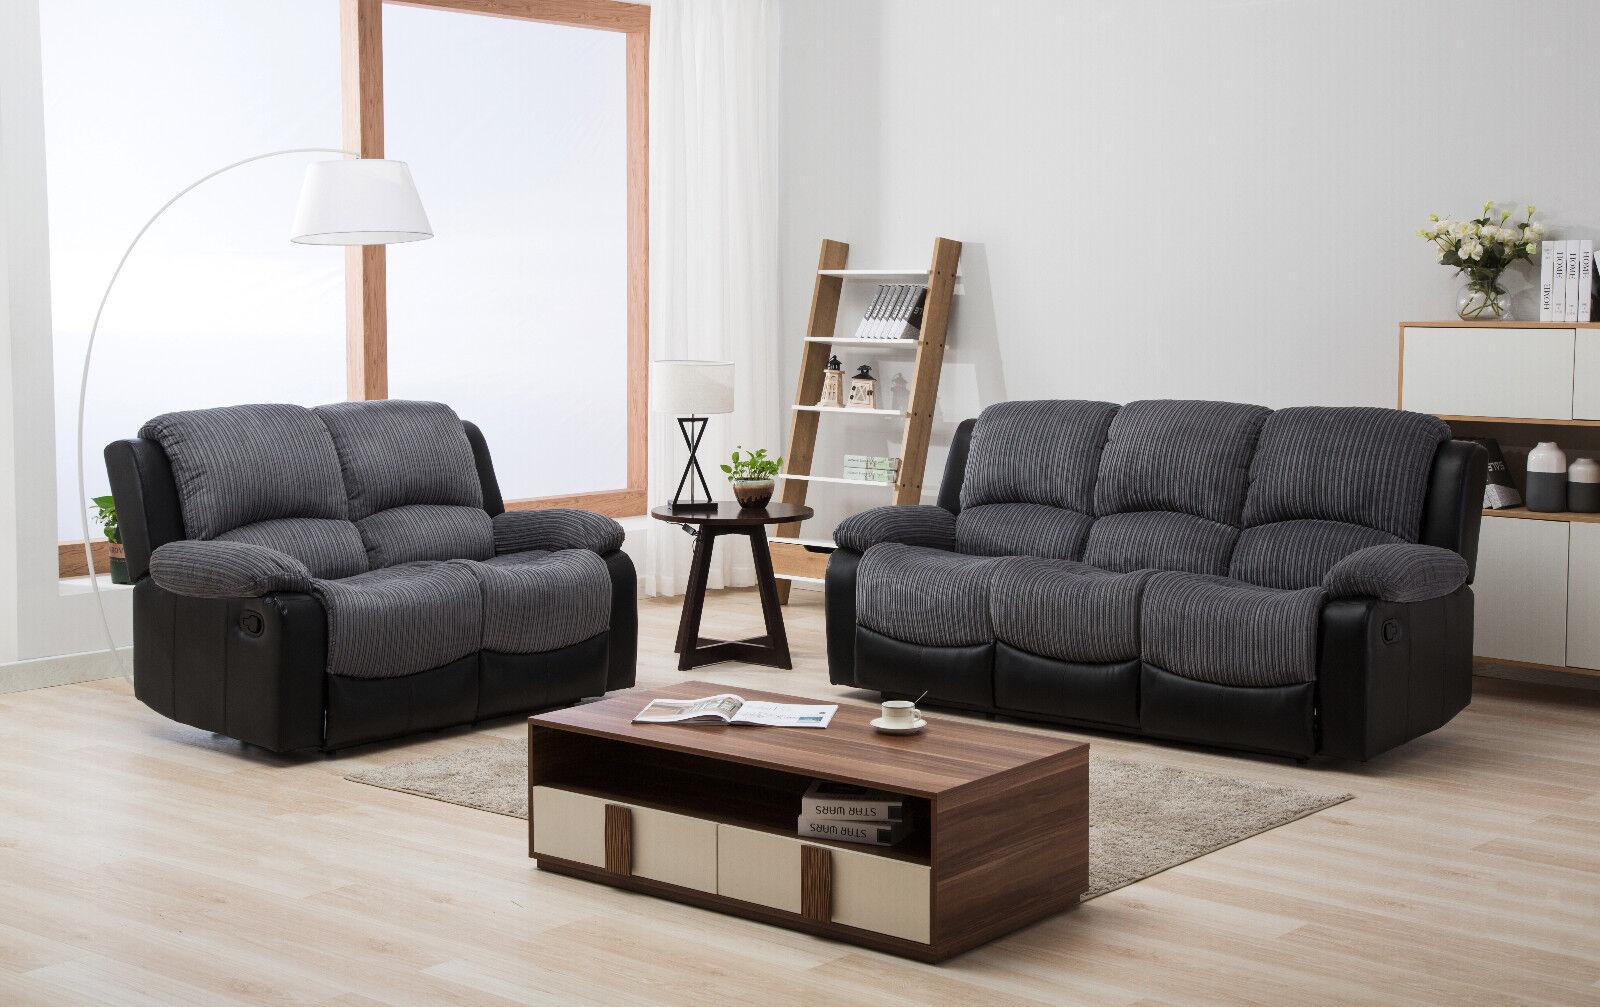 New Marsha Fabric Reclining Sofa Set Black And Grey 3 2 Recliner Sofa Suite